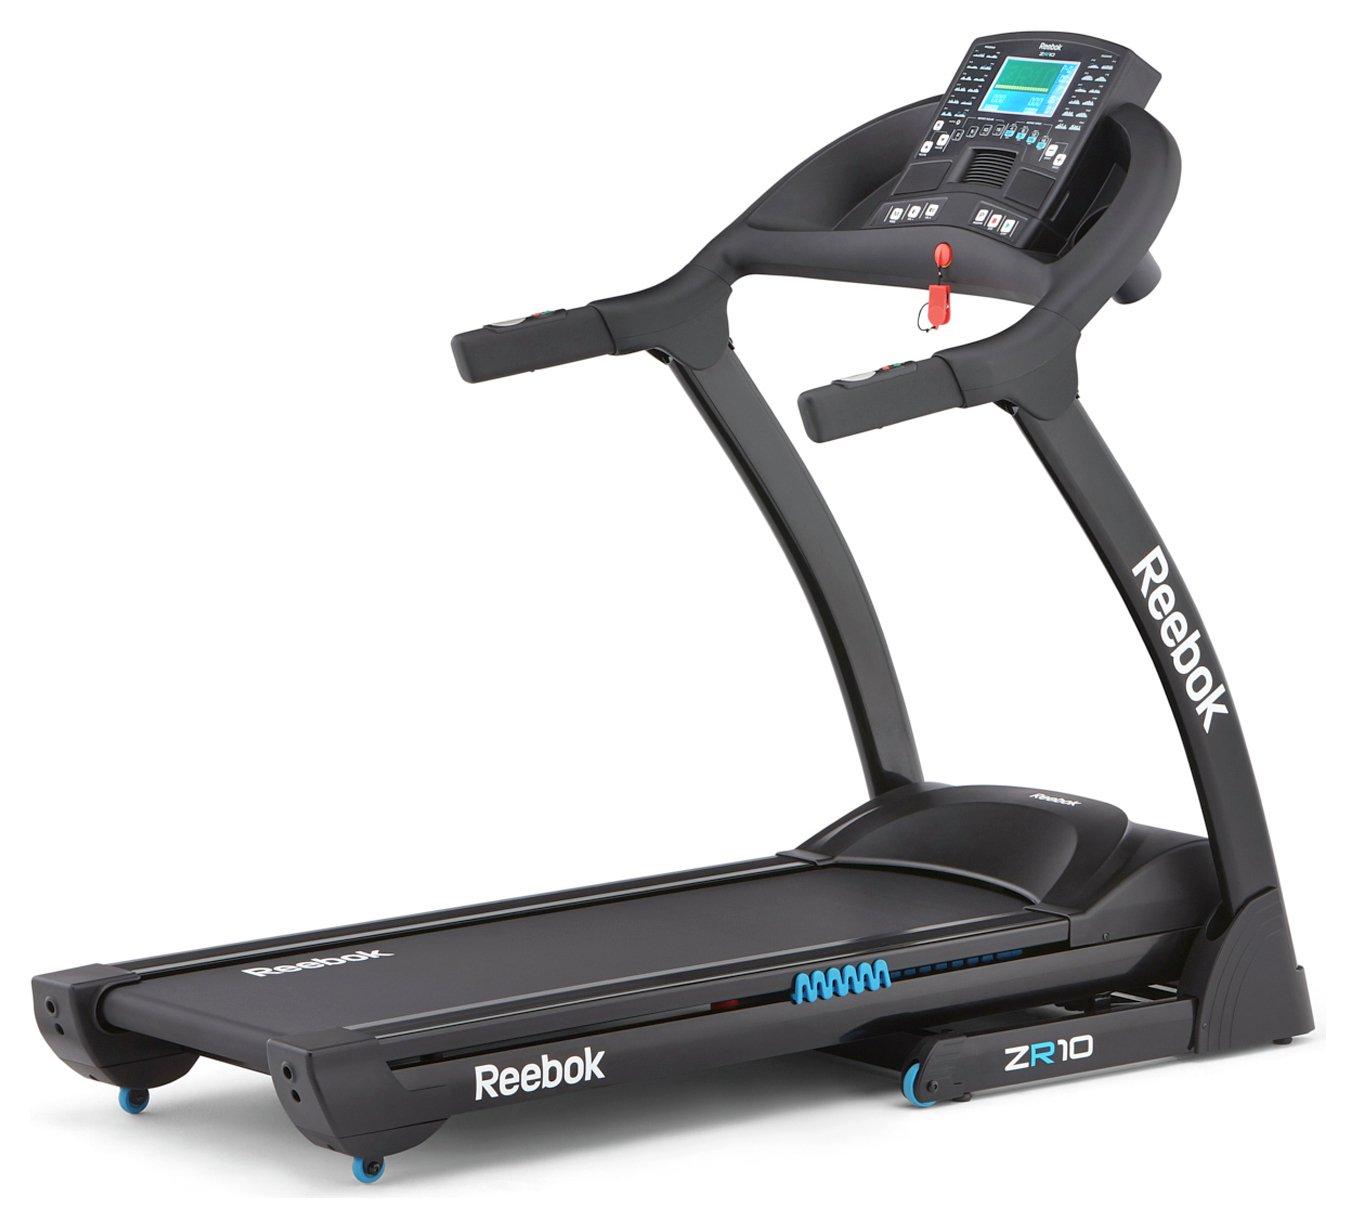 Zr11 treadmill reebok fitness youtube.